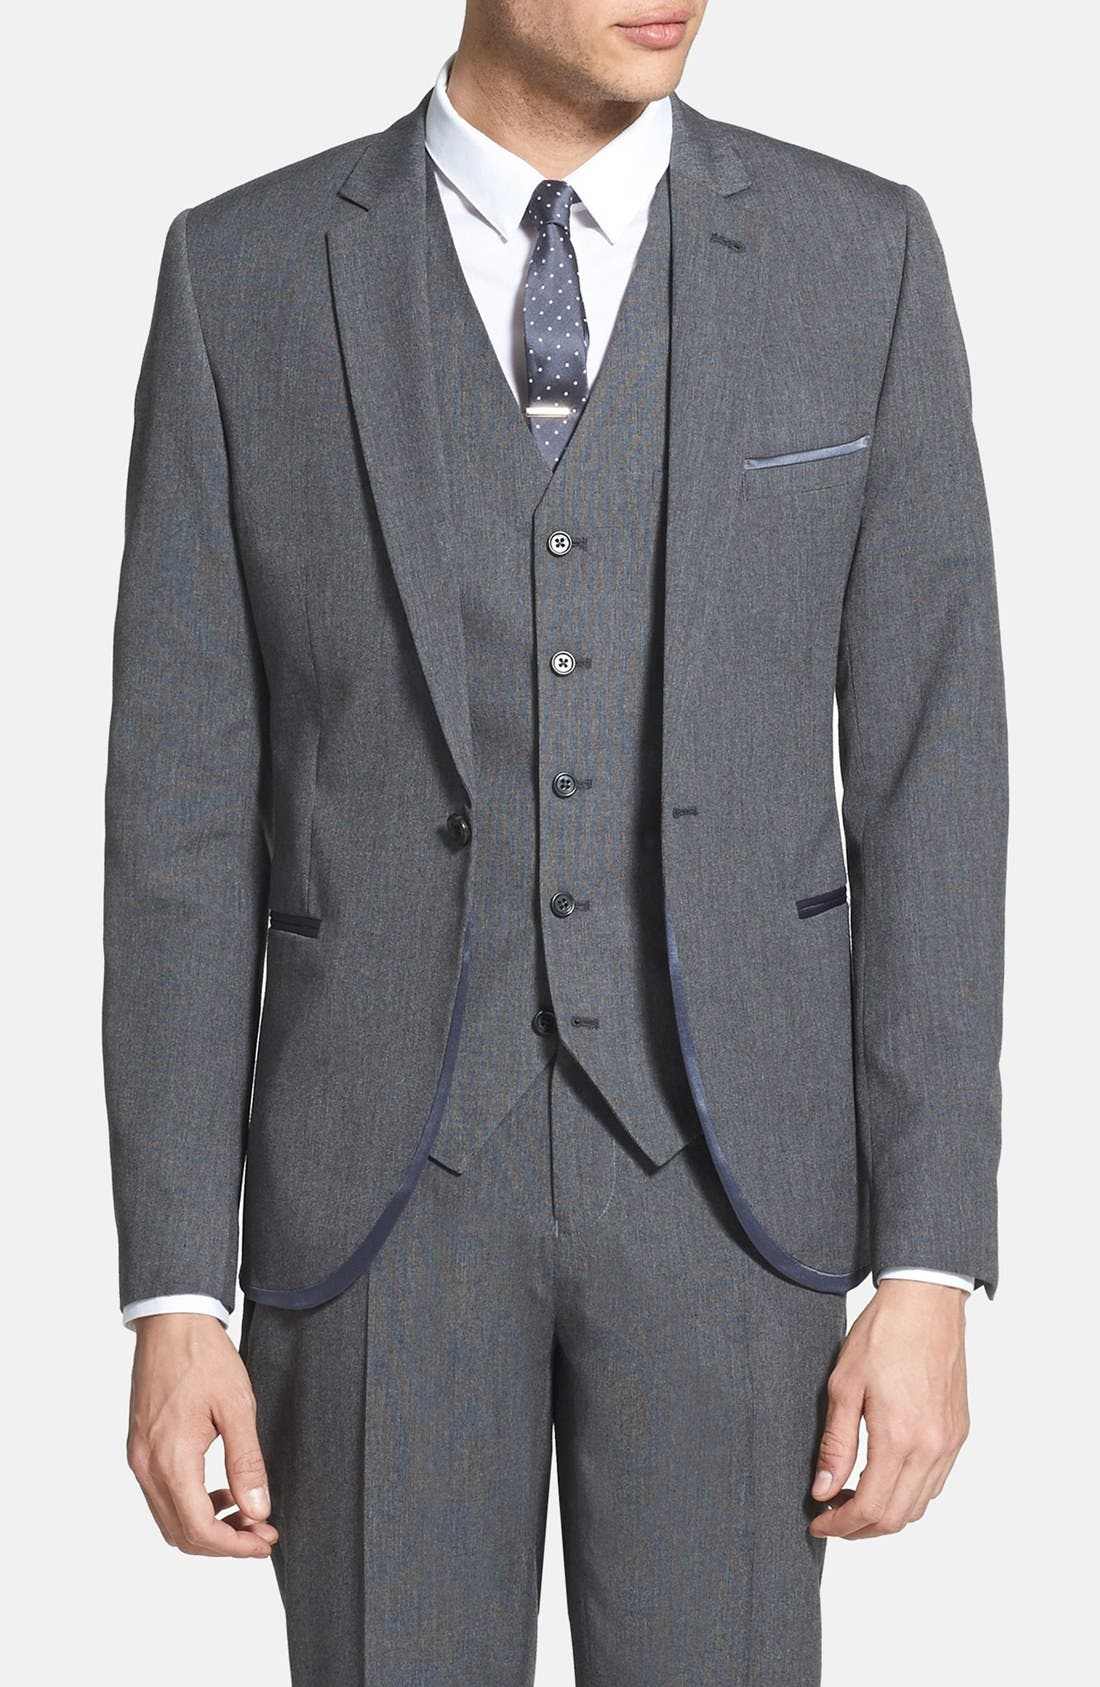 Main Image - Topman Skinny Fit Satin Trim Grey Suit Jacket